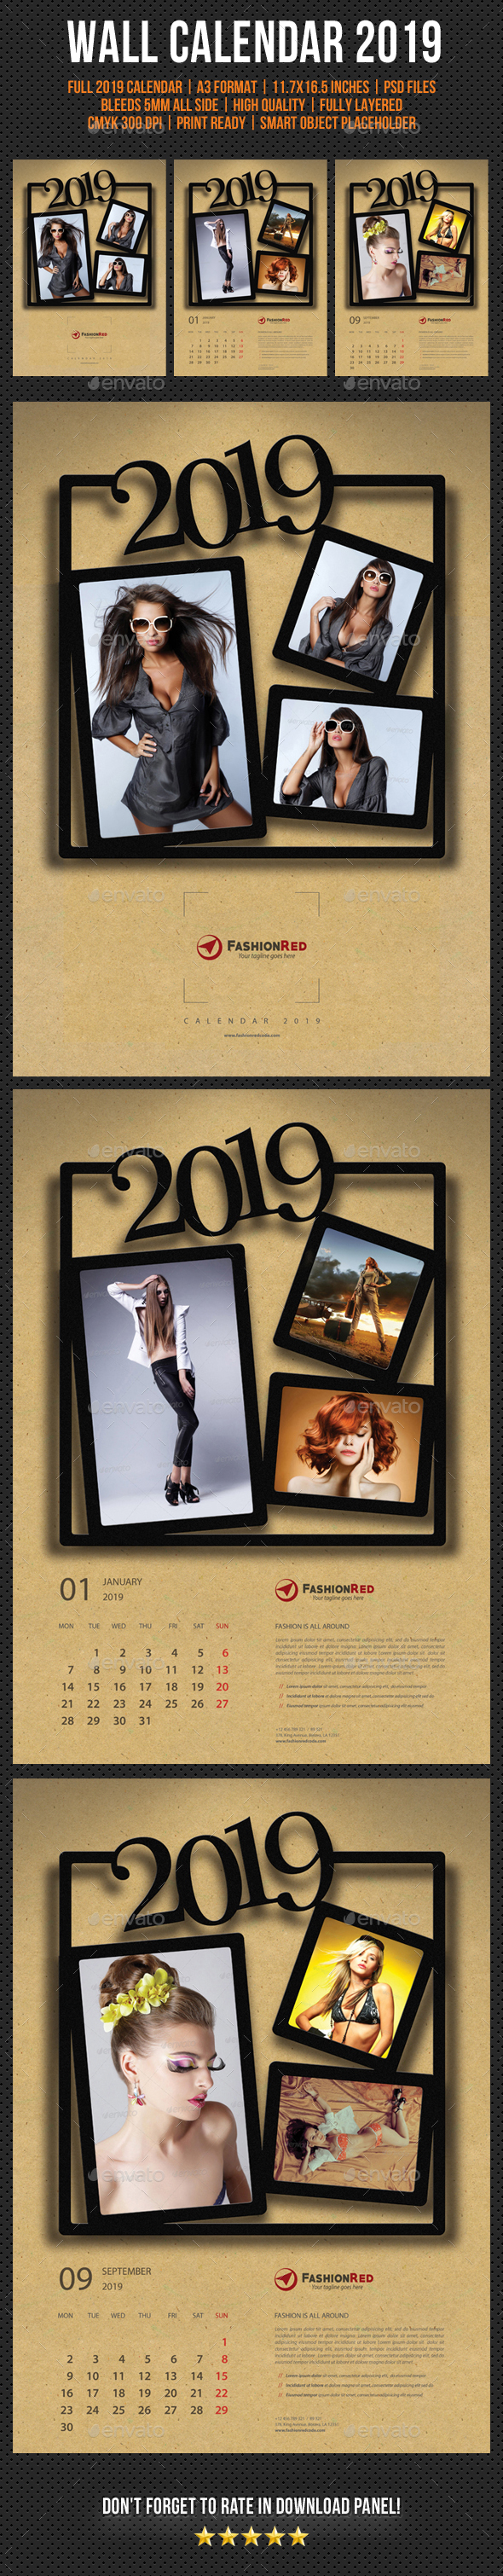 Wall Calendar A3 2019 V04 - Calendars Stationery